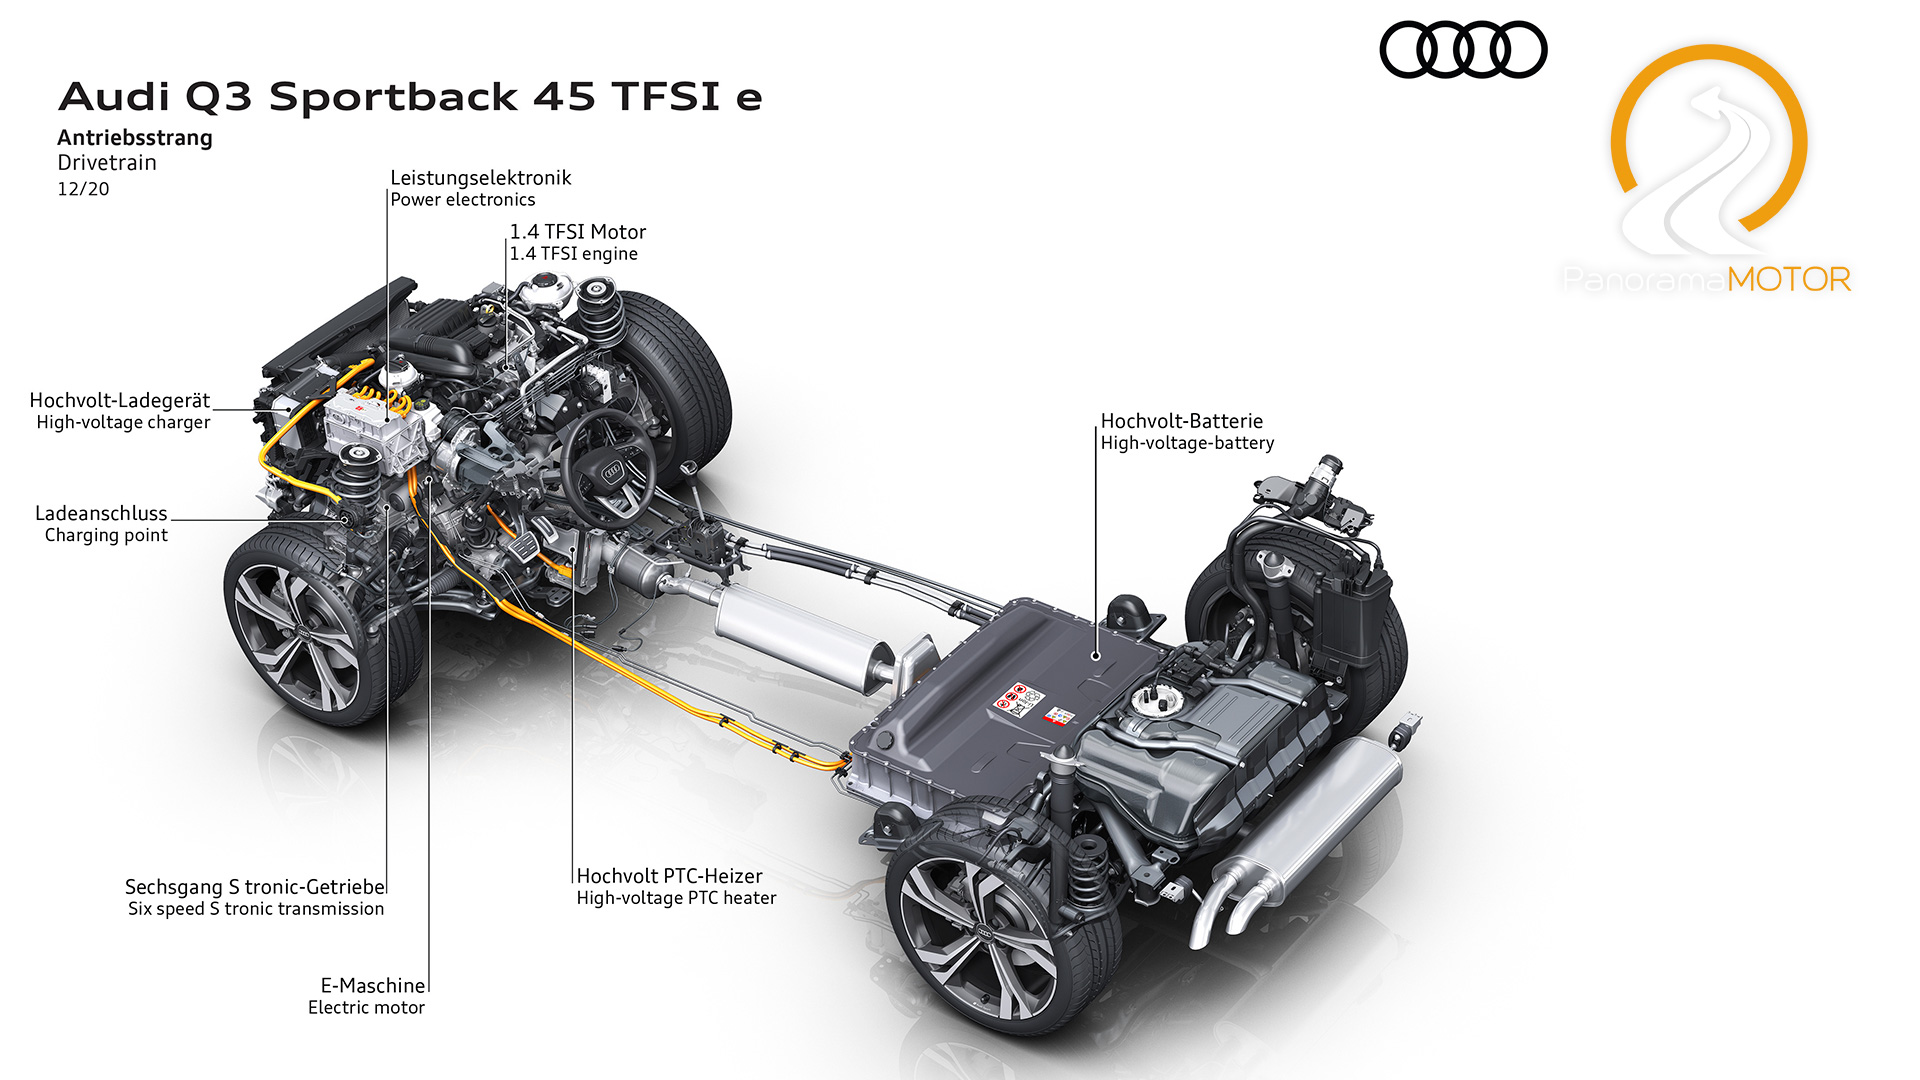 Audi Q3 Sportback 45 TFSIe 2021